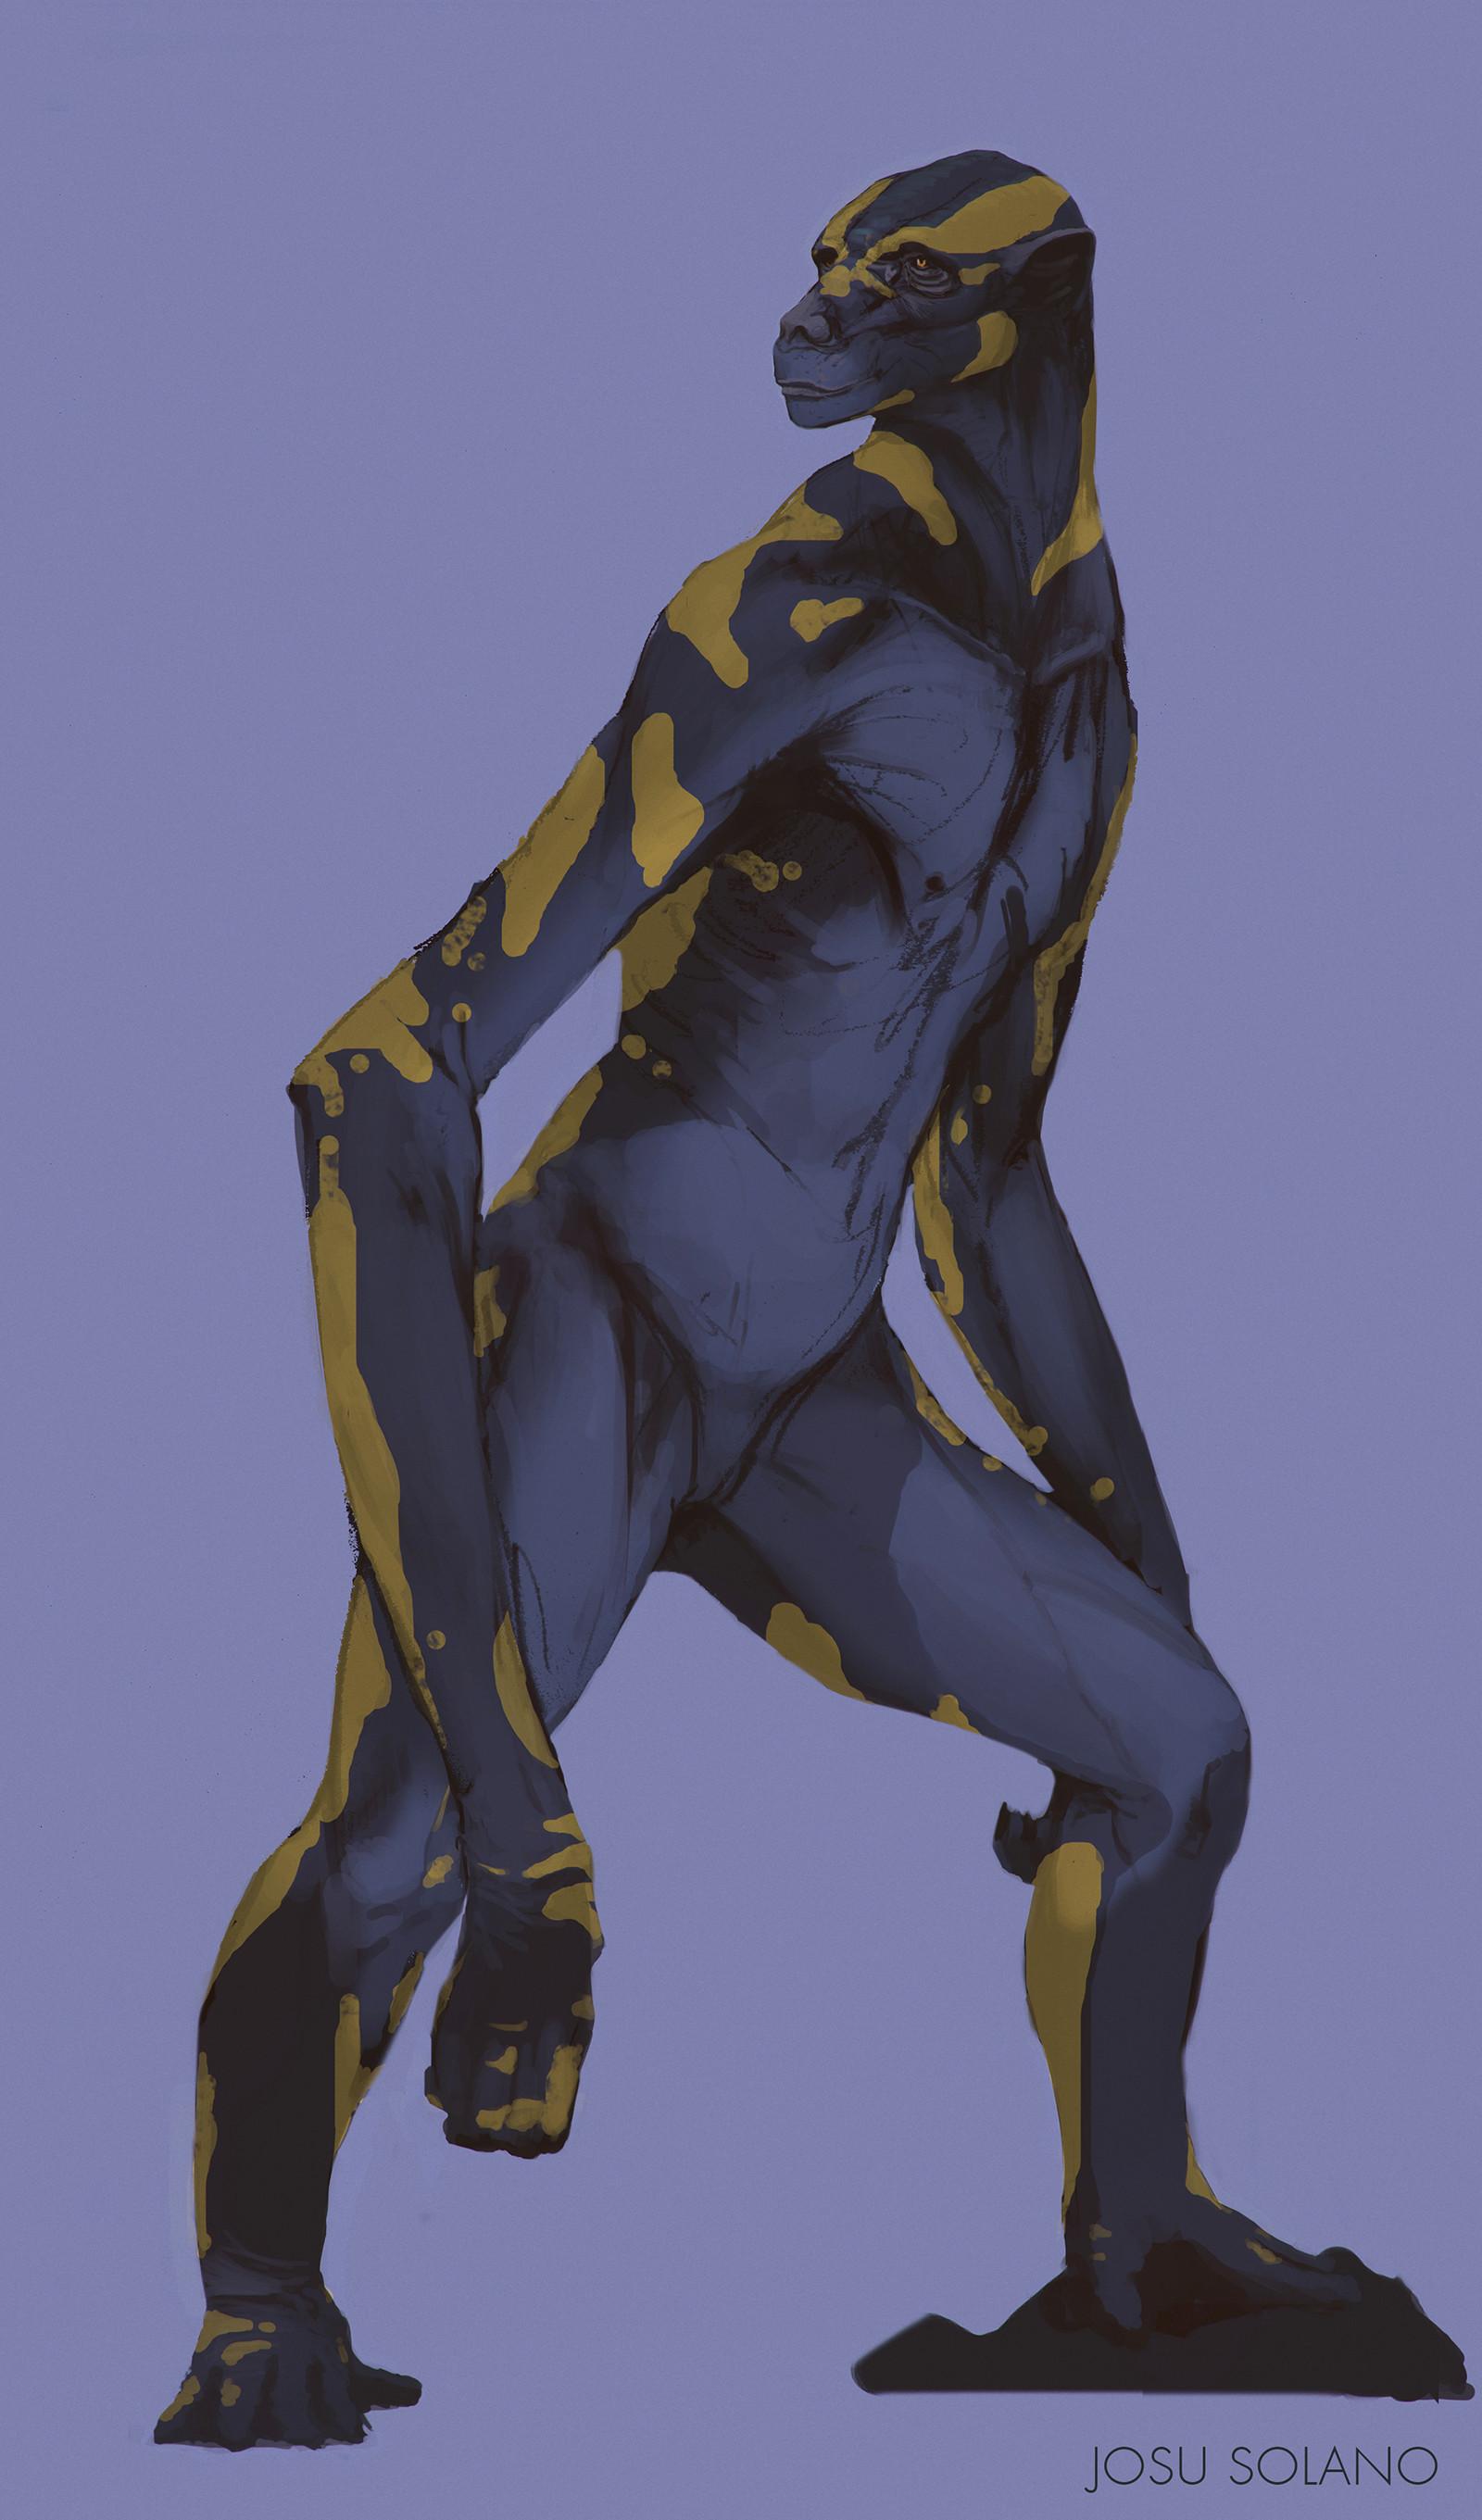 Josu solano humanoid sketch